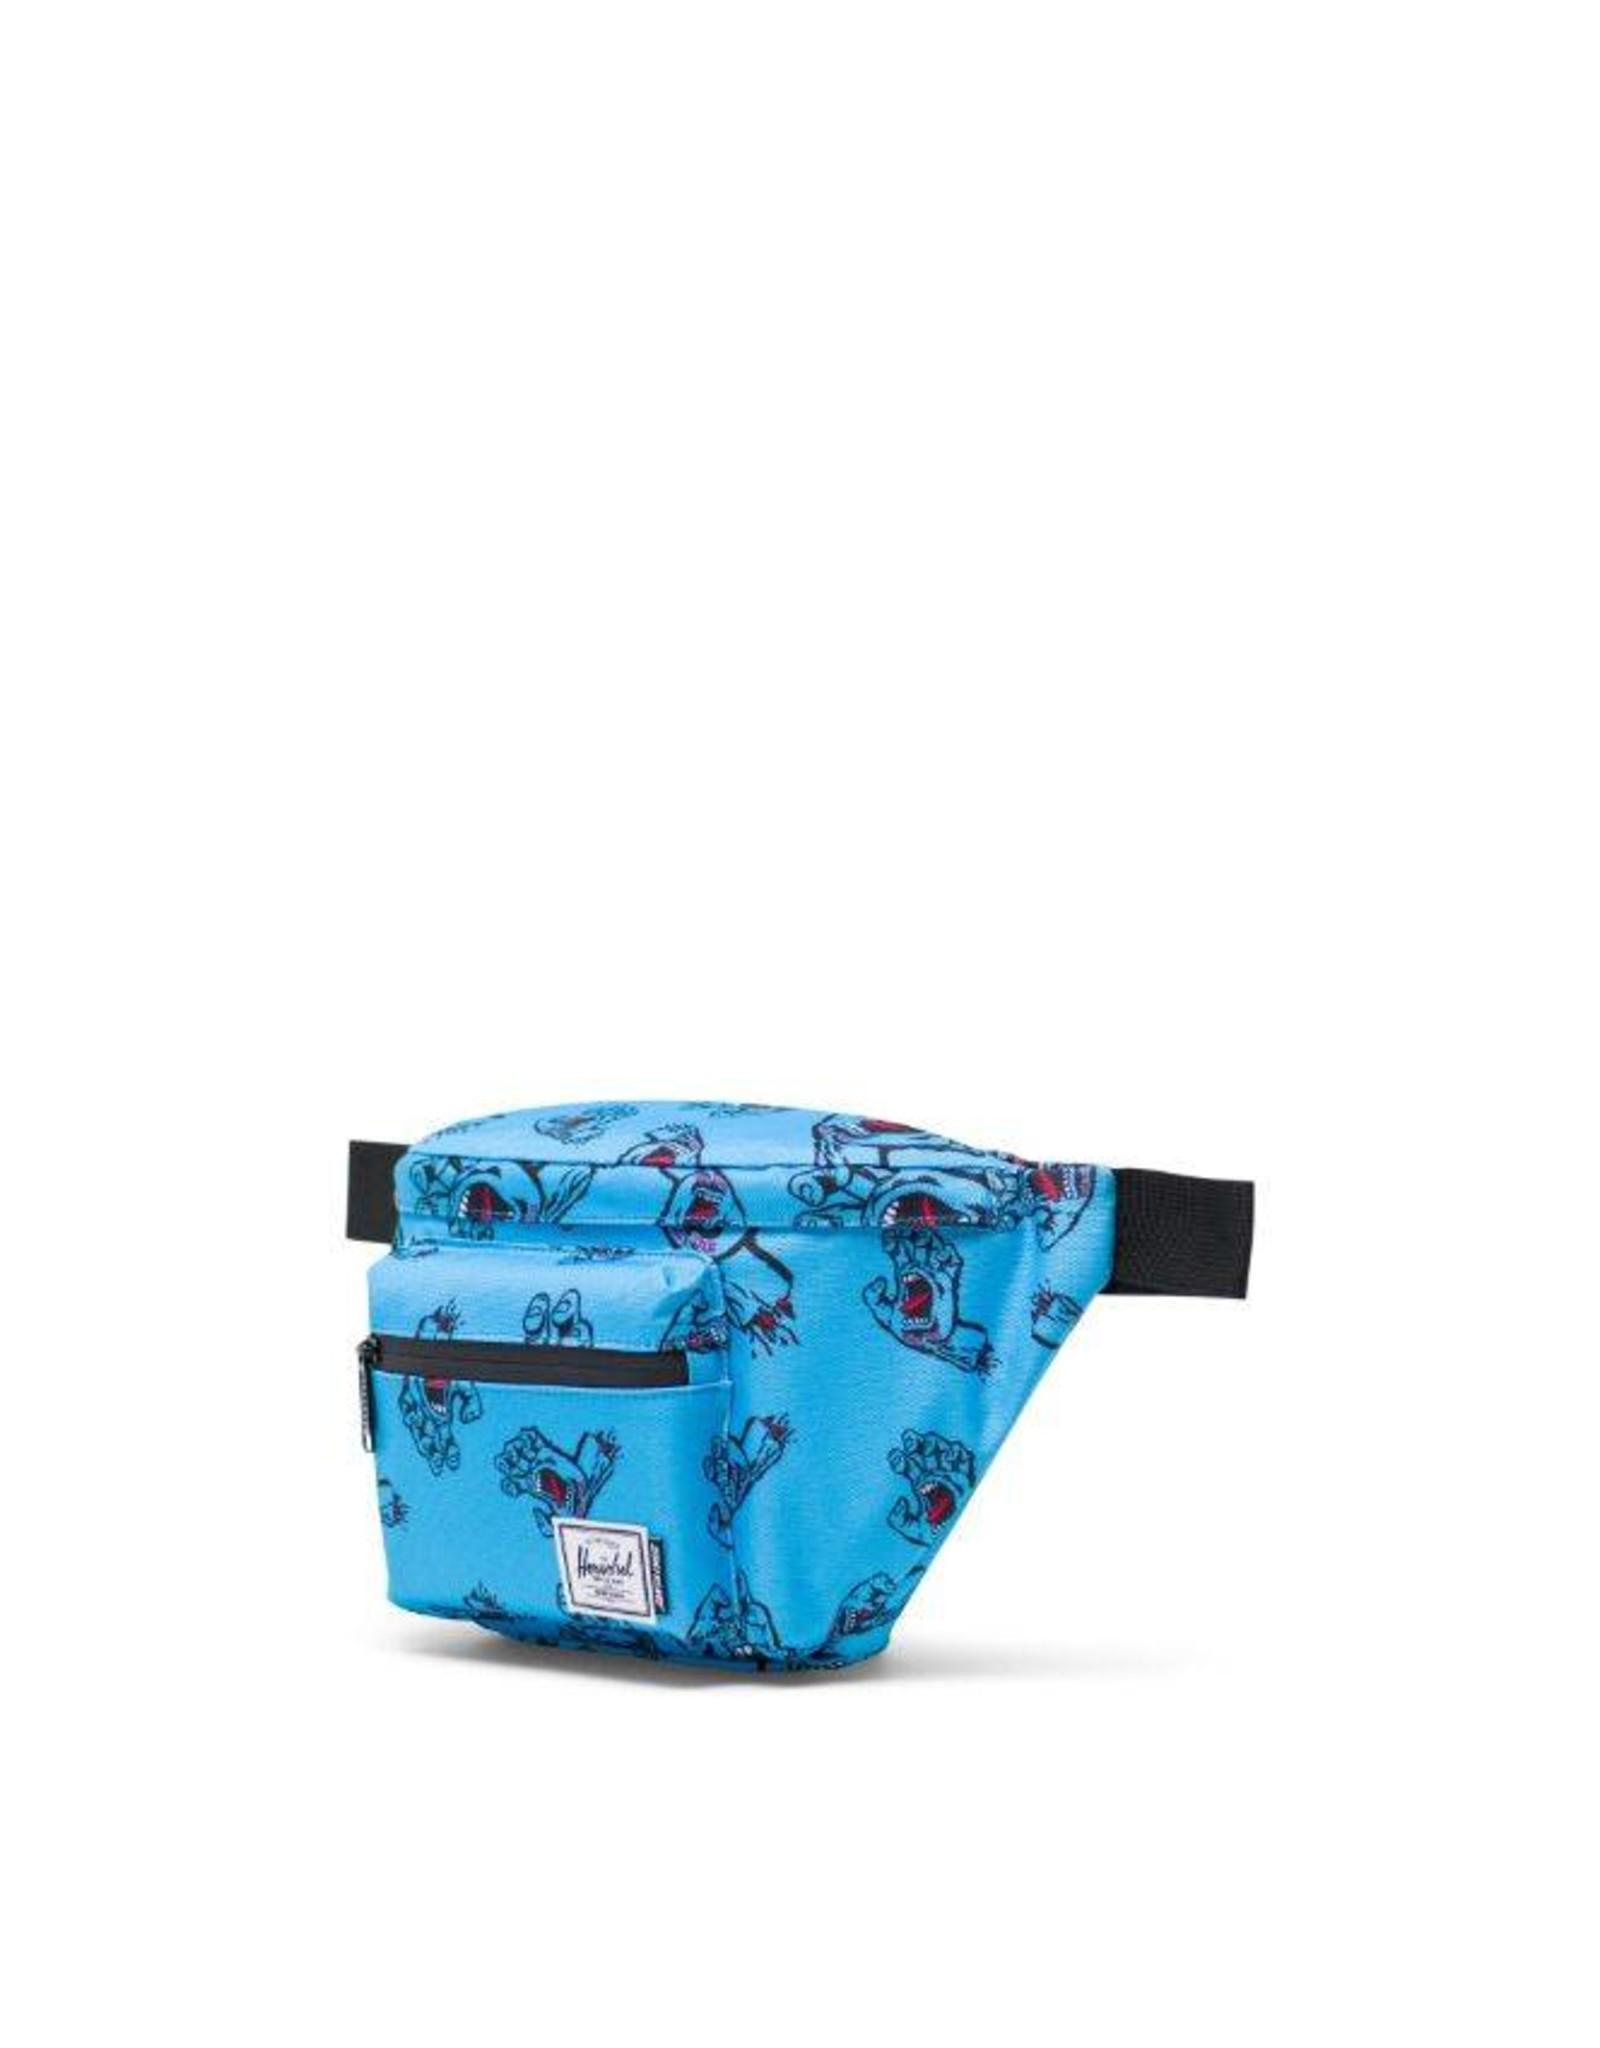 HERSCHEL HERSCHEL X SANTA CRUZ SEVENTEEN HIP PACK - SANTA CRUZ BLUE